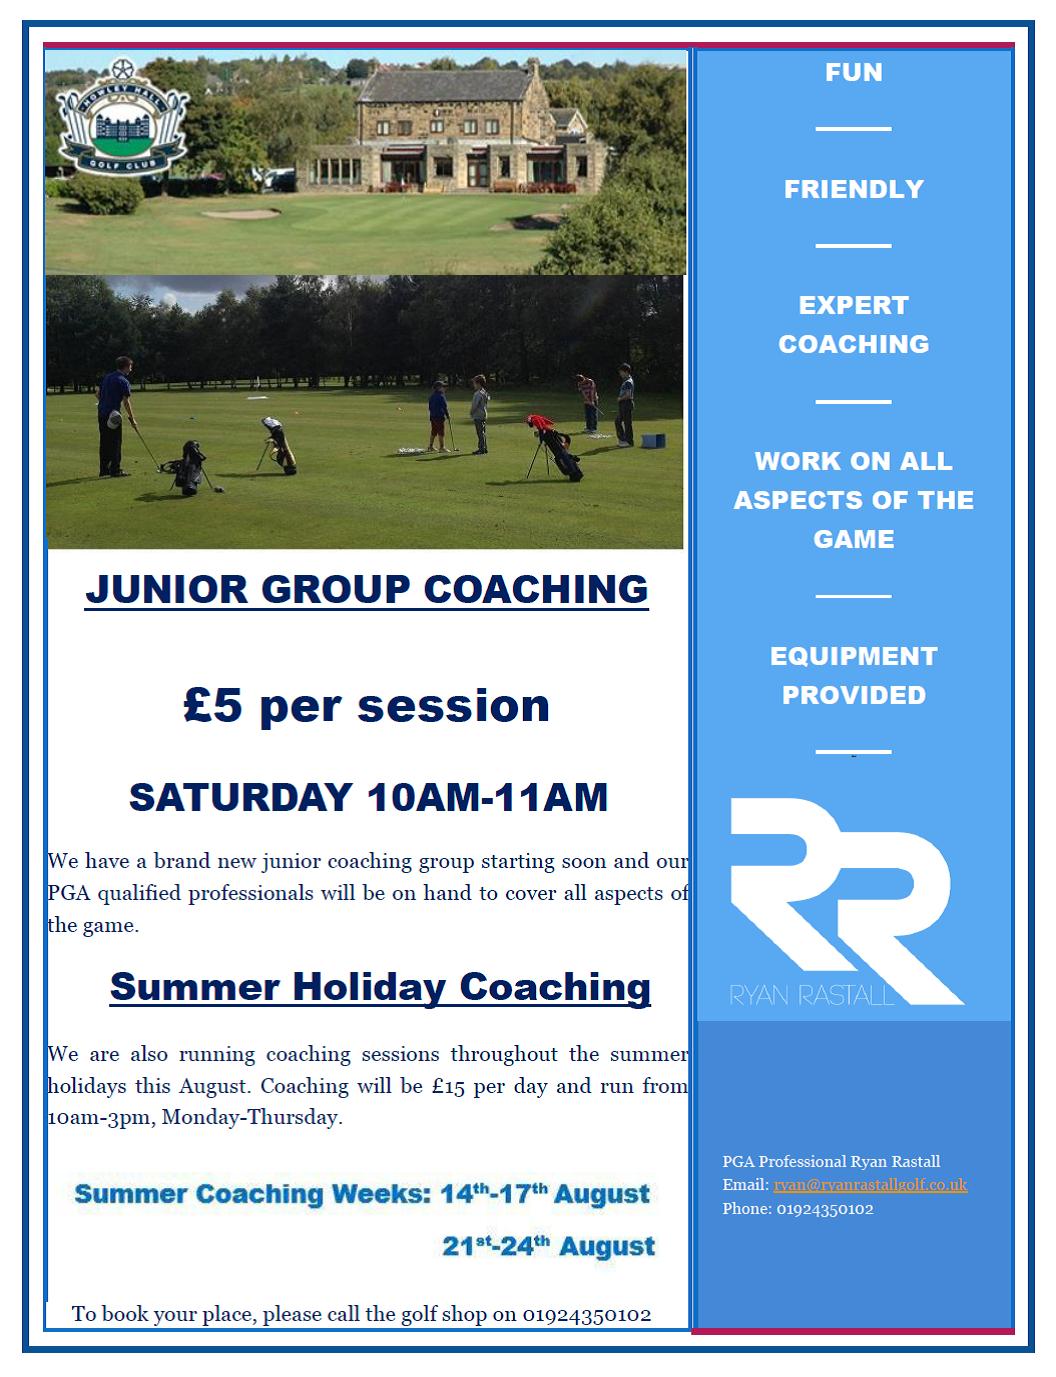 Howley Hall Golf Club - Summer Holiday coaching